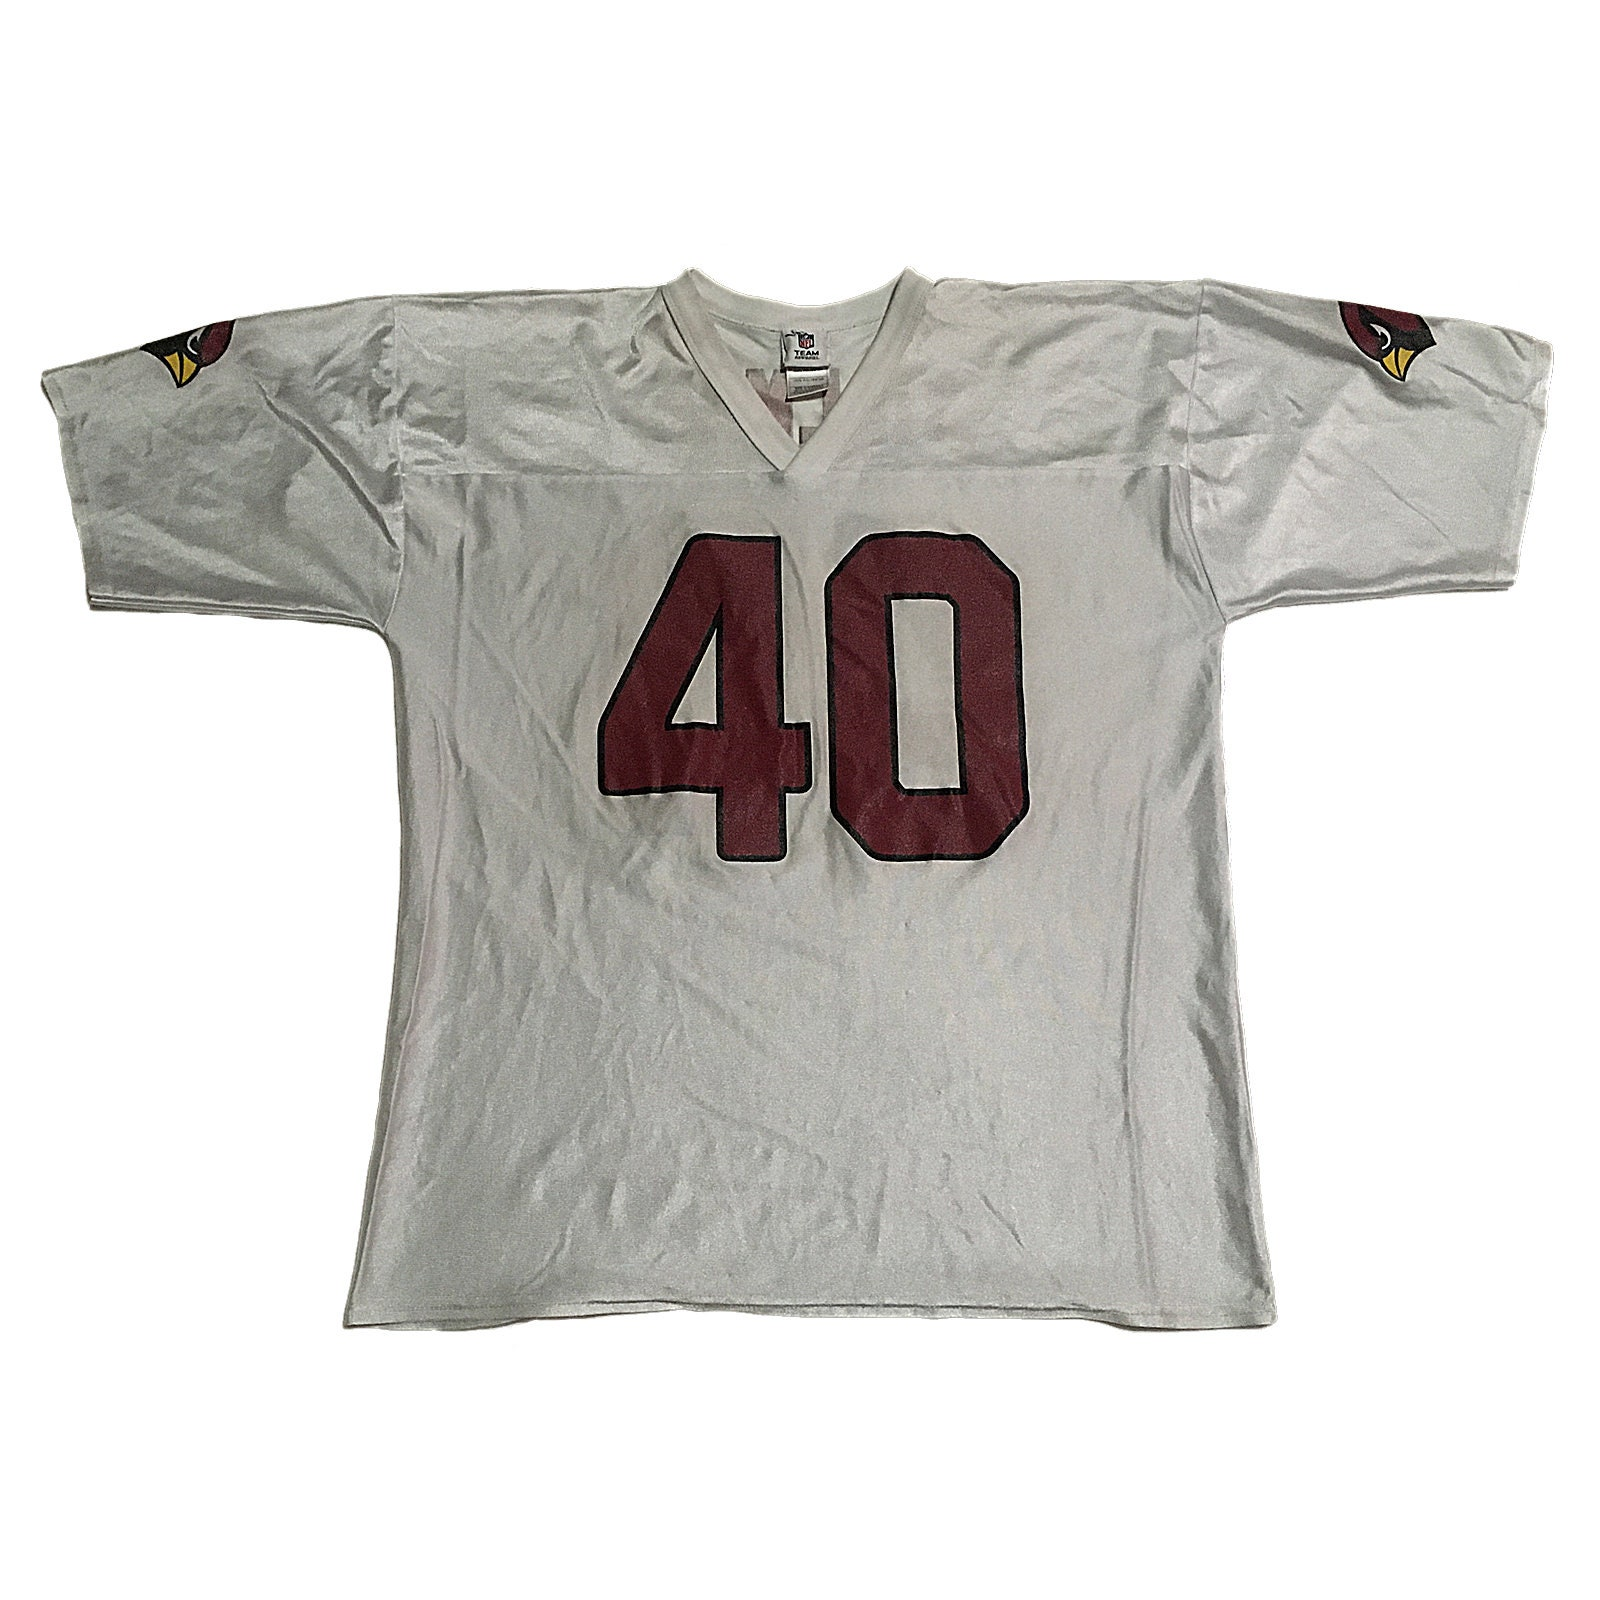 vintage arizona cardinals jersey